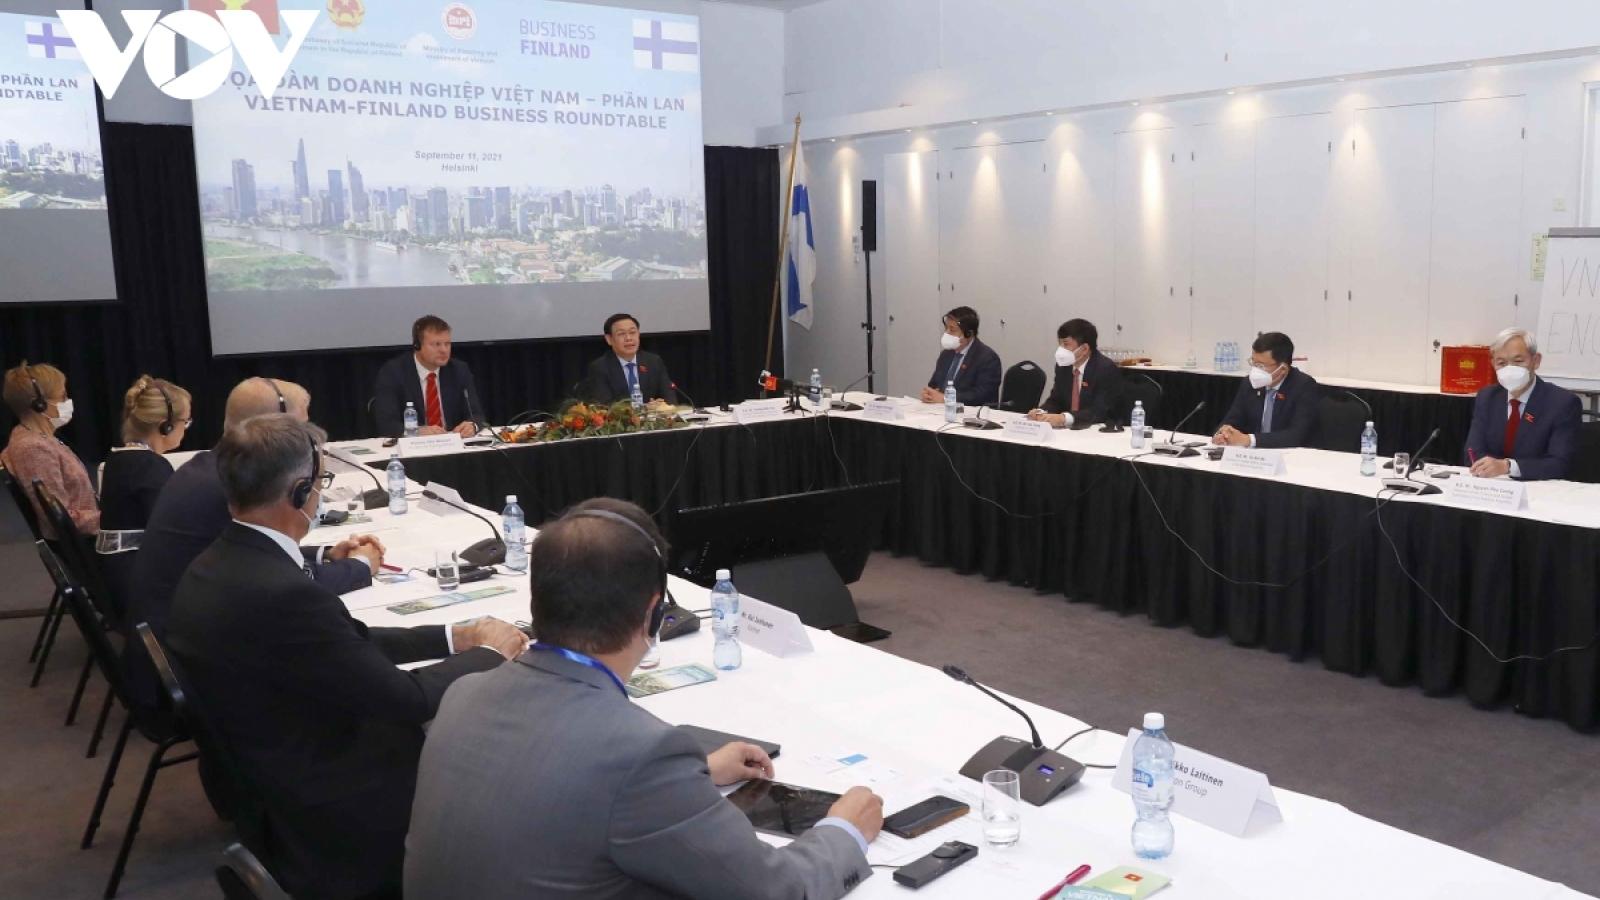 Legislature leader supports Vietnam-Finland business connectivity